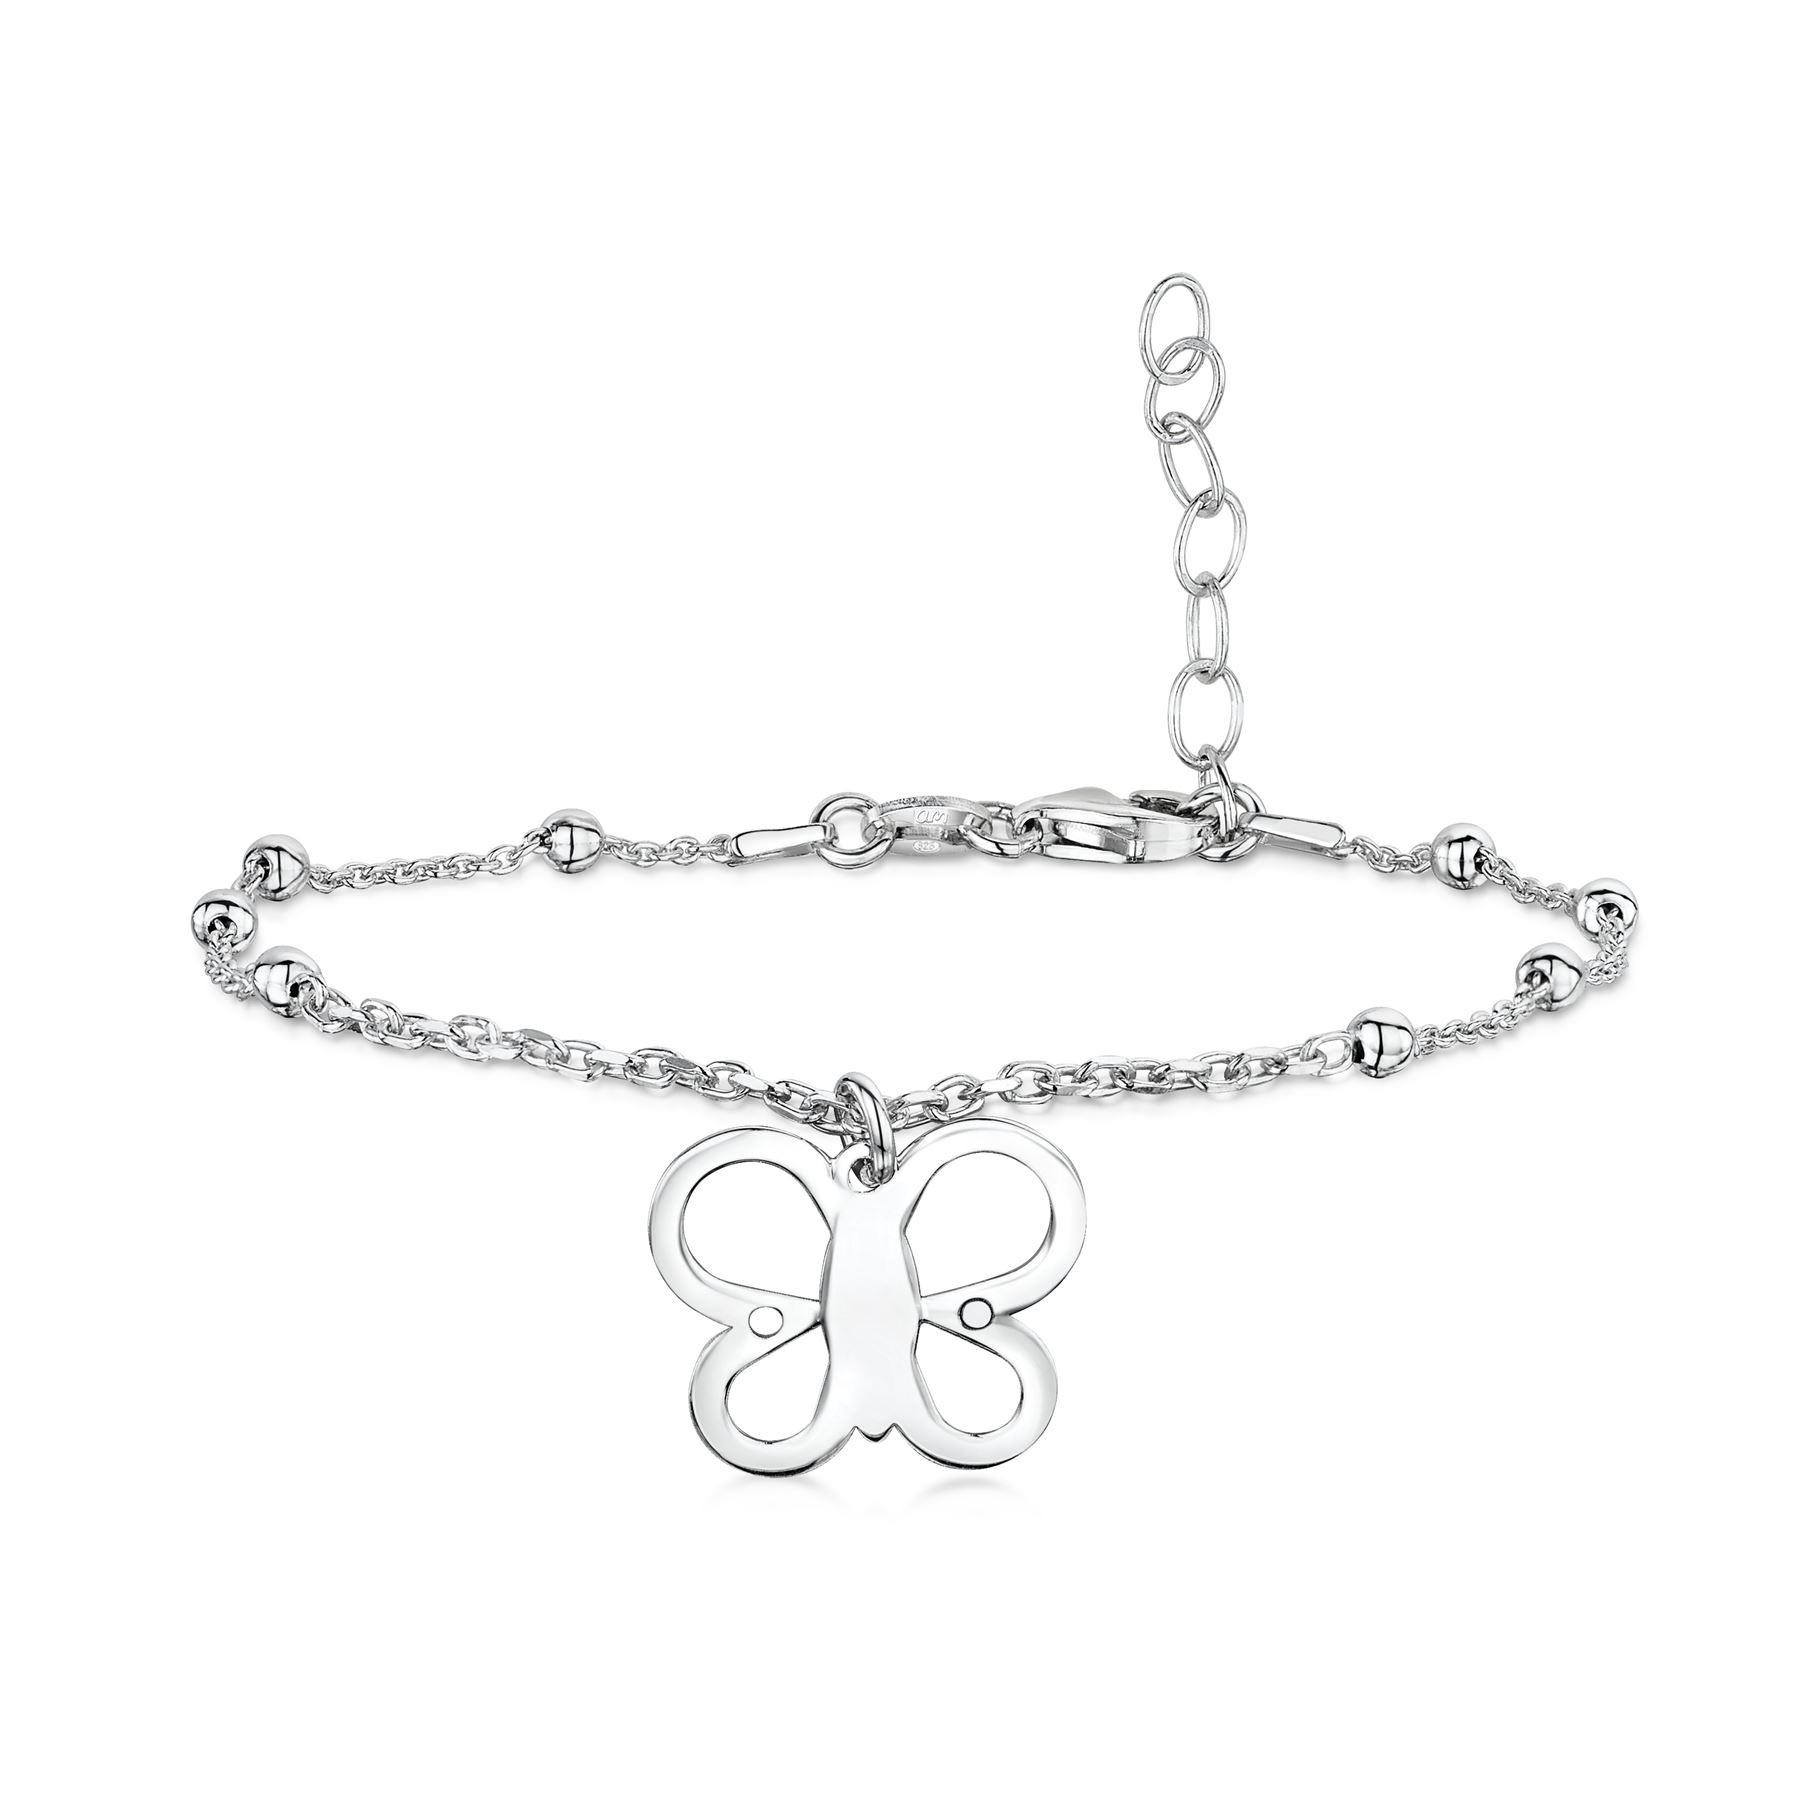 Amberta-Jewelry-925-Sterling-Silver-Adjustable-Bracelet-Italian-Bangle-for-Women miniature 48